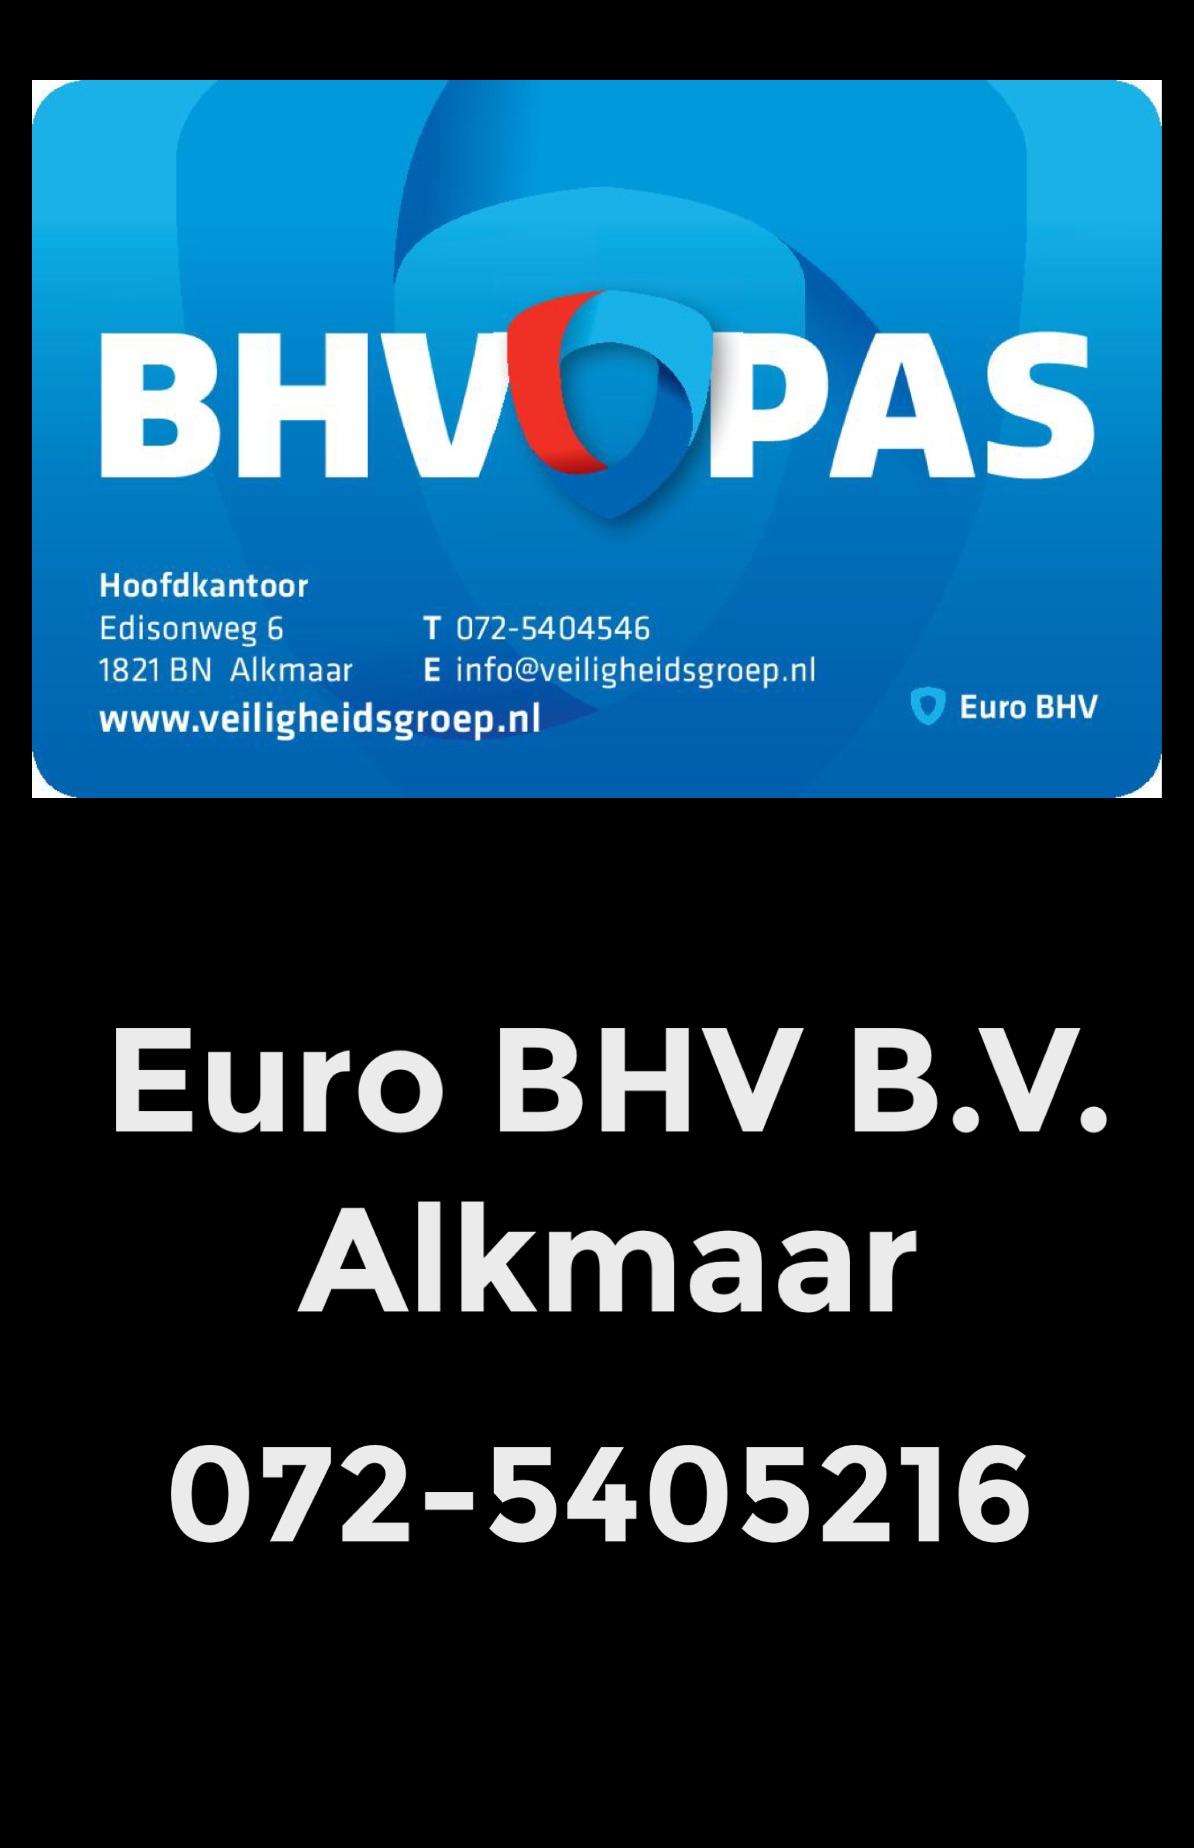 BHVpas